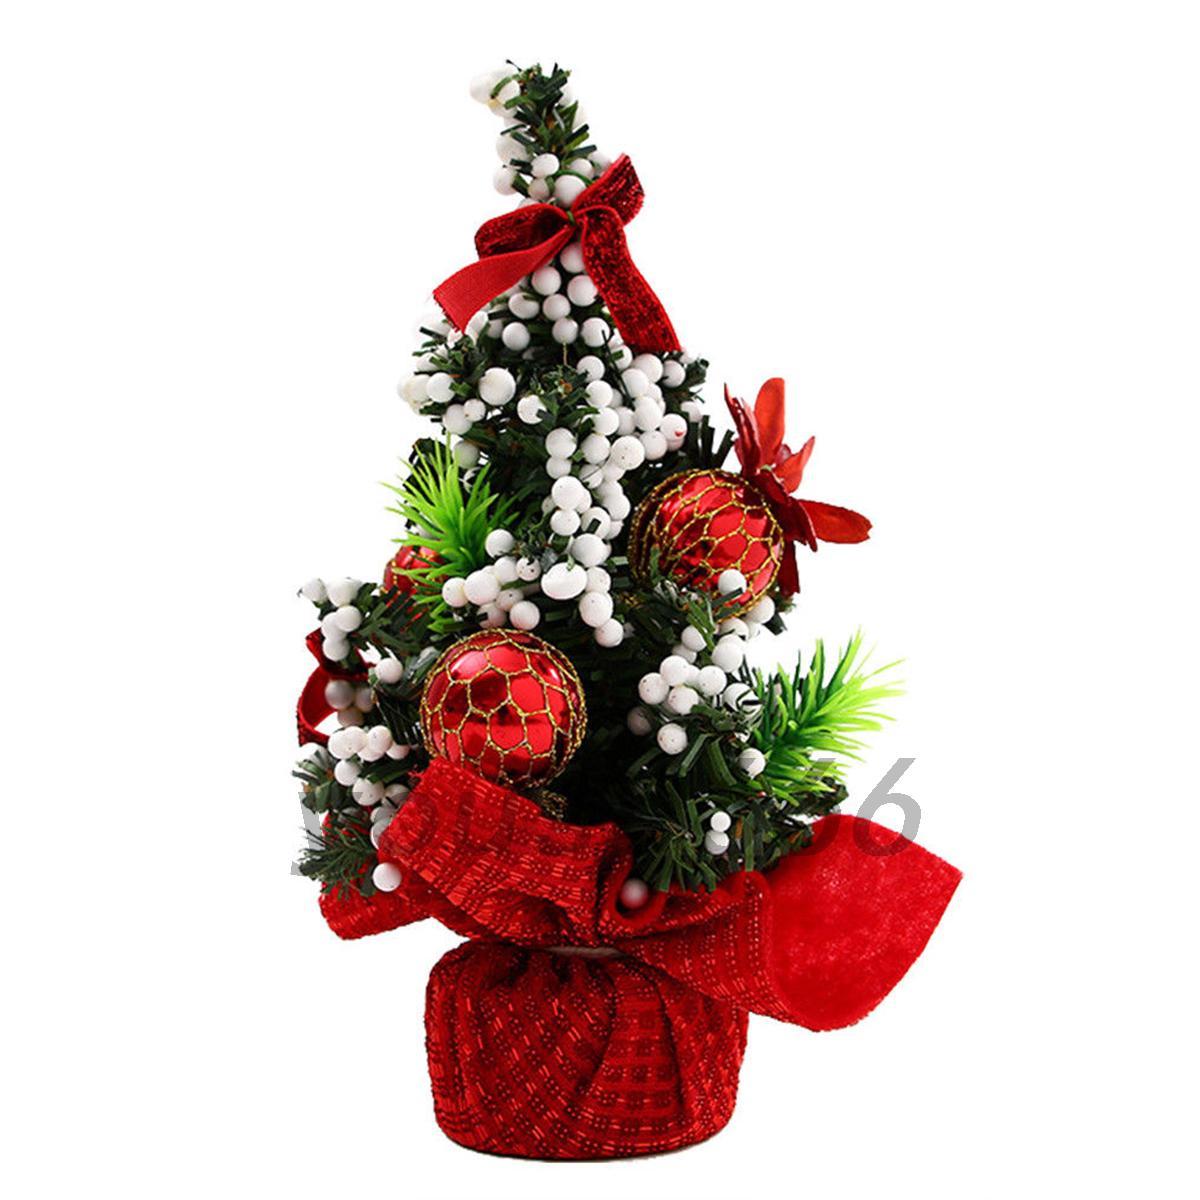 Desk-Table-Top-Mini-Christmas-Xmas-Christmas-Tree-Small-Party-Ornaments-Decor